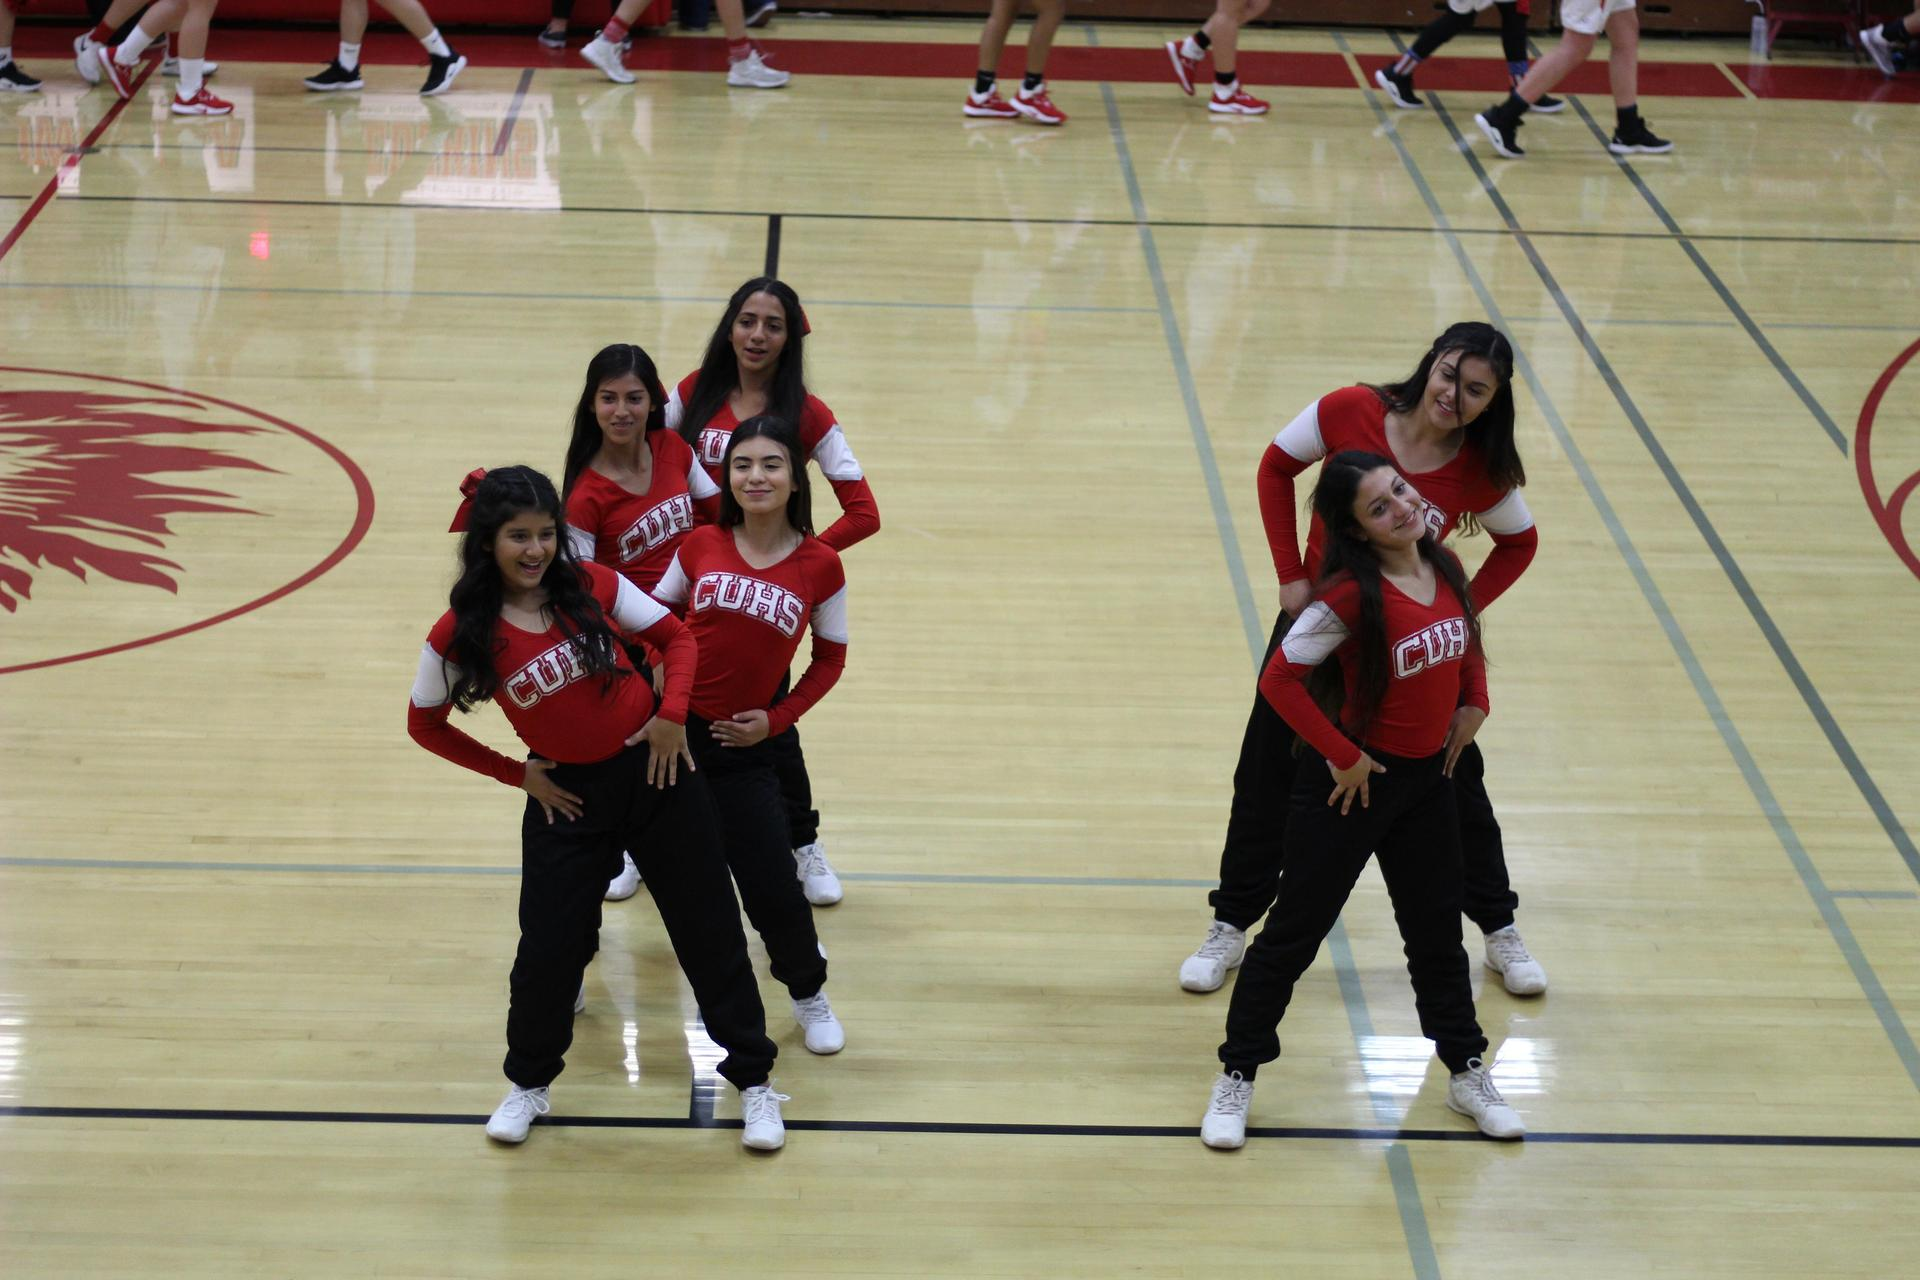 Chowchilla Tribe cheering